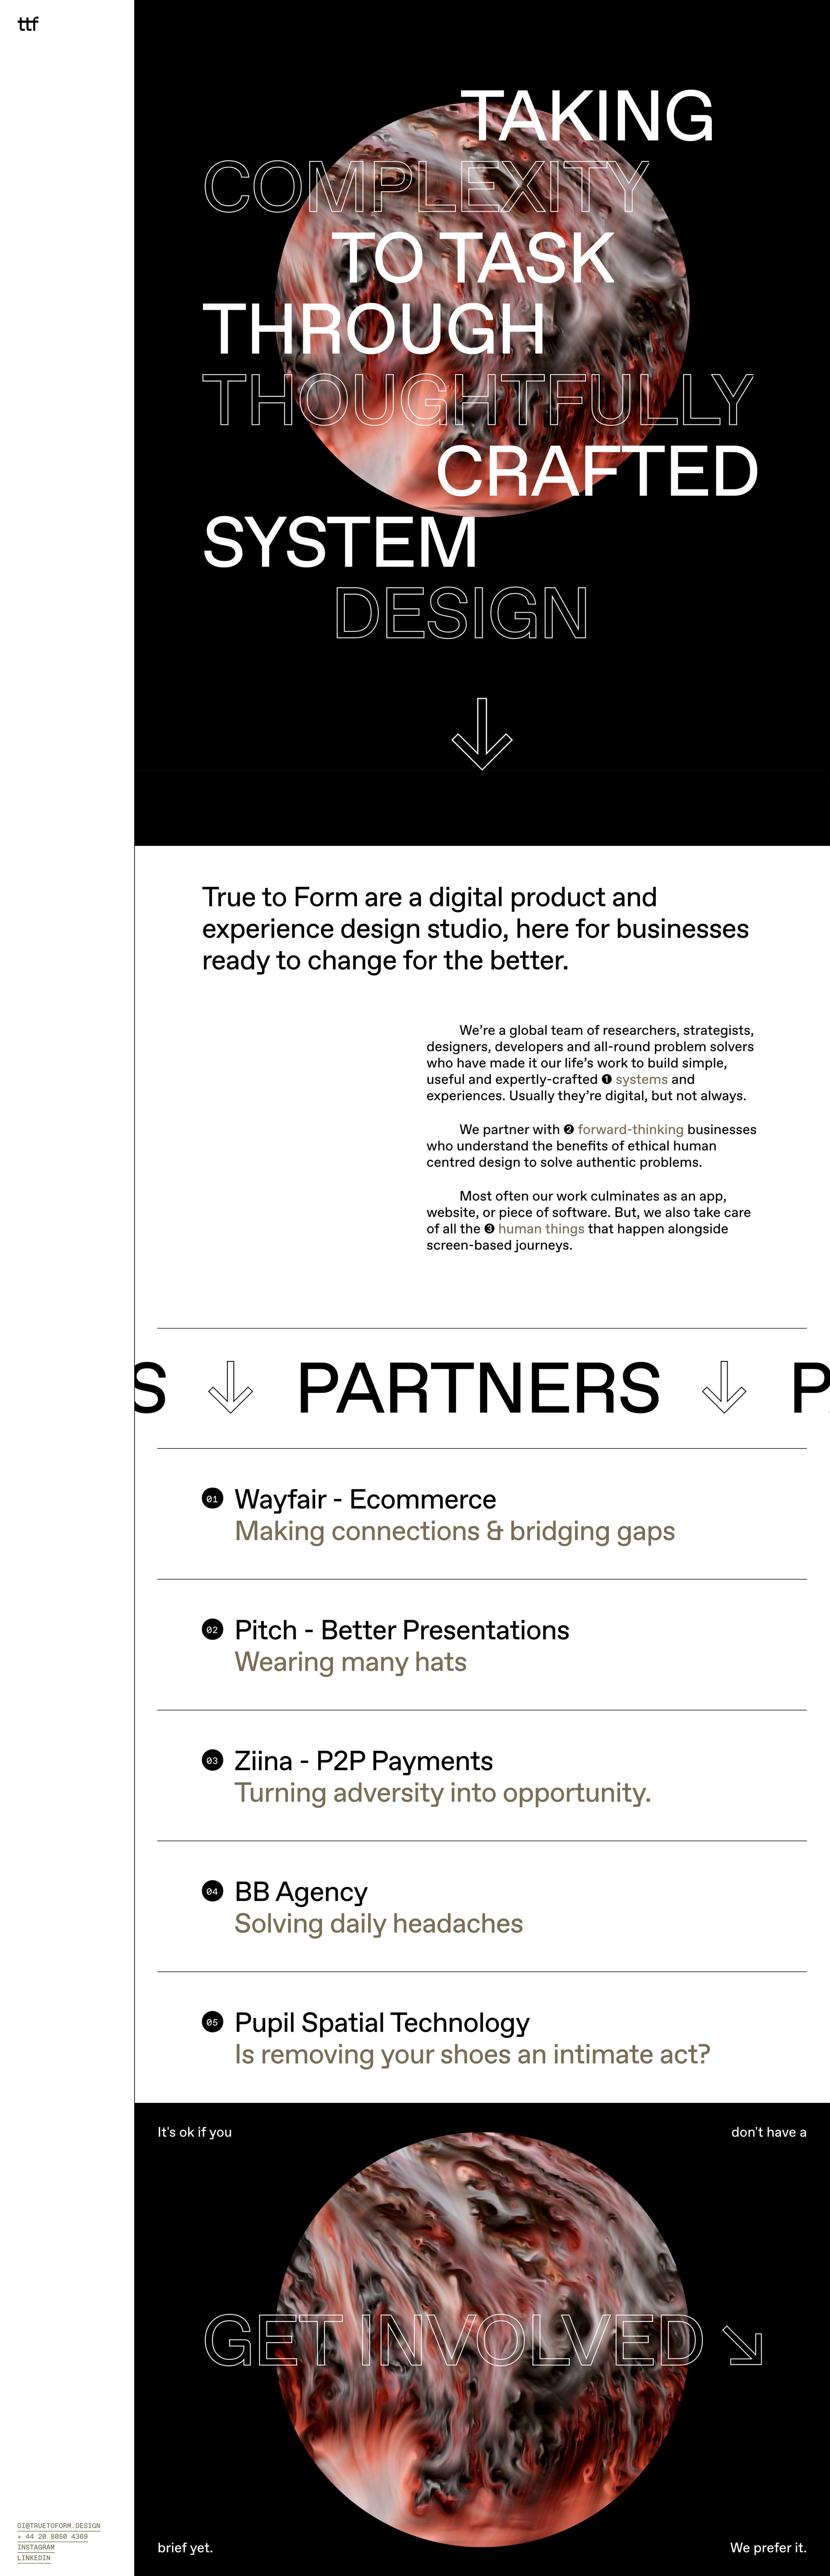 True to Form Website Screenshot